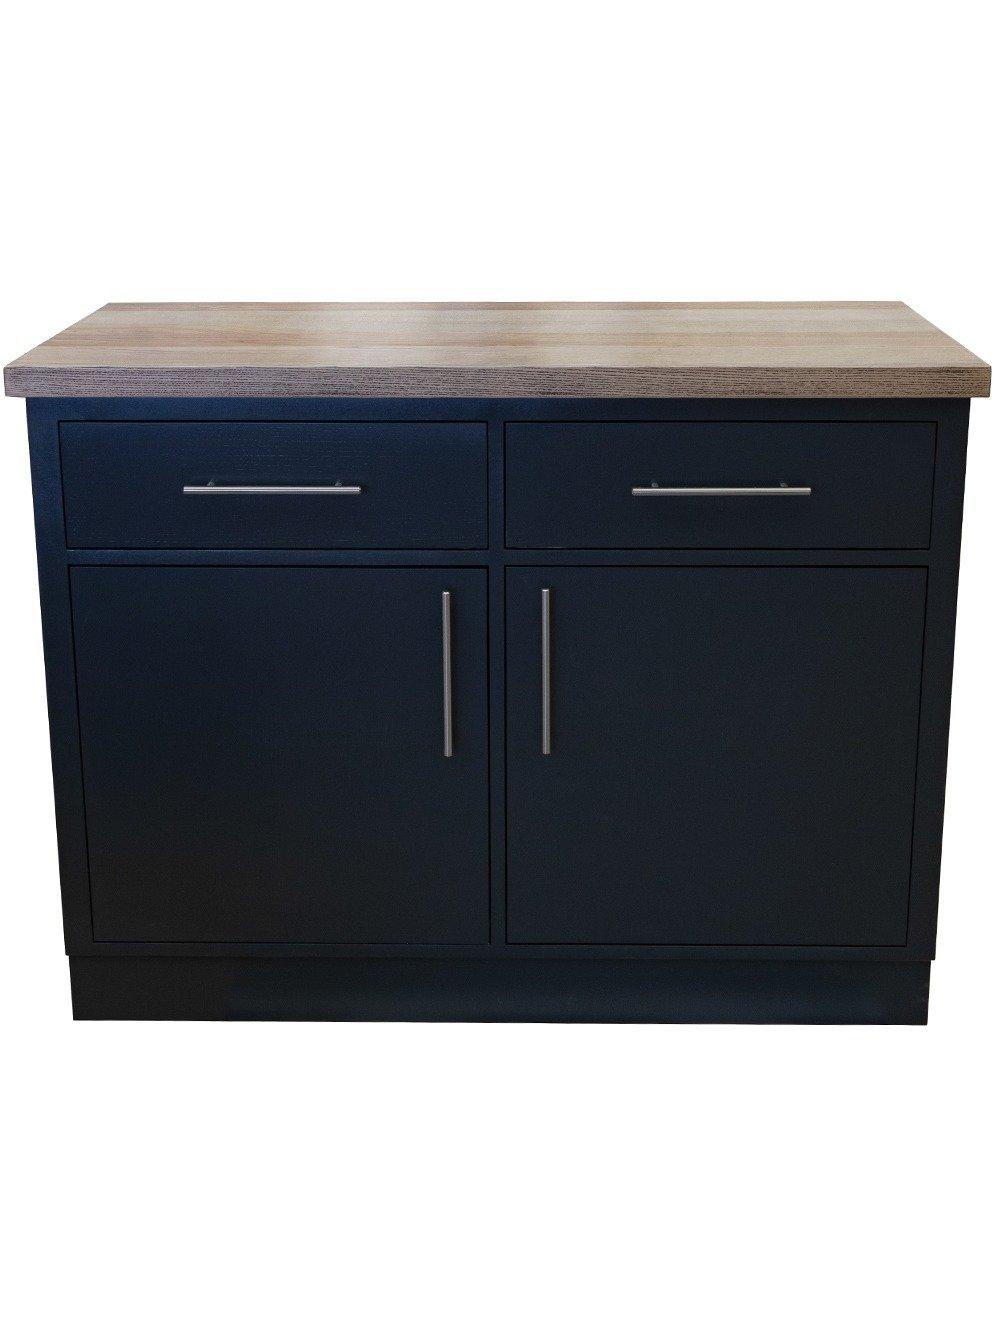 Dumbwaiter 5 | Custom Furniture UK | Carlick Contract Furniture